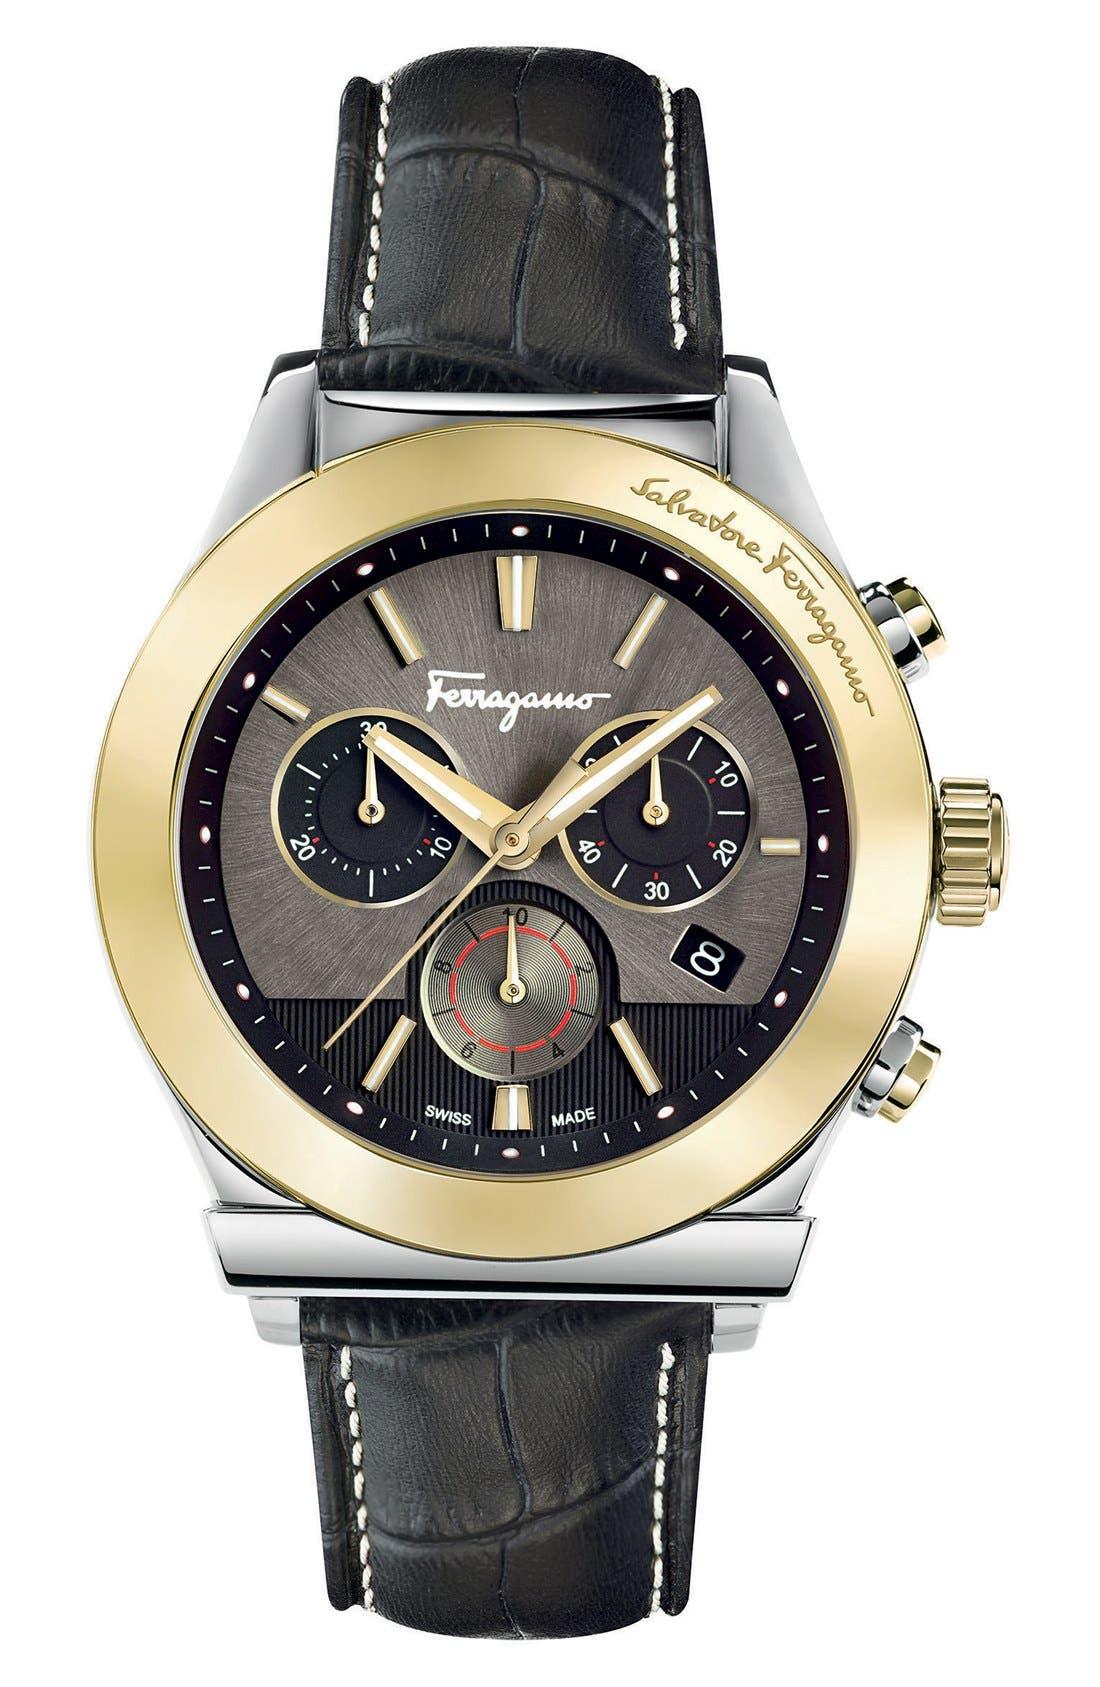 Main Image - Salvatore Ferragamo '1898' Chronograph Leather Strap Watch, 42mm